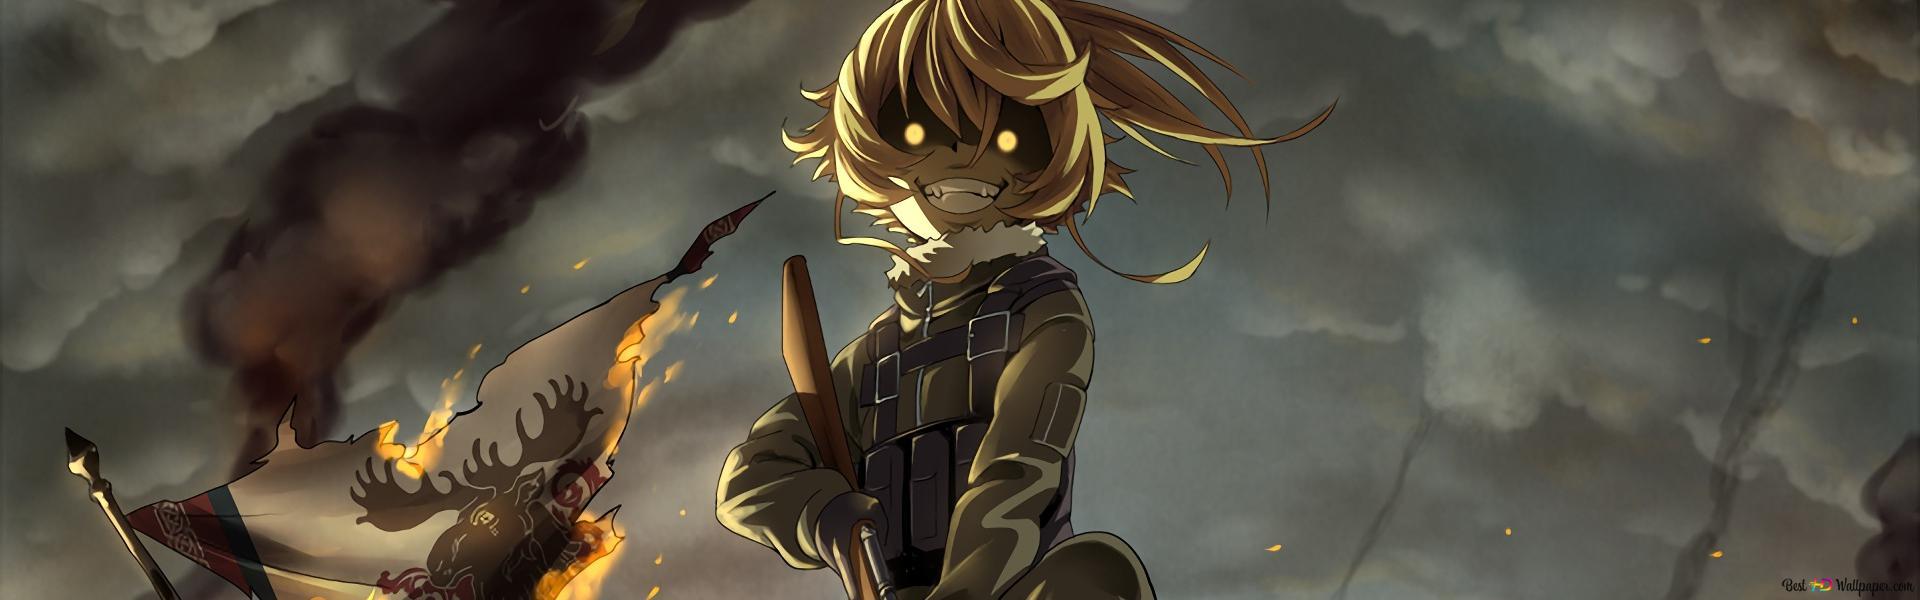 Saga Of Tanya The Evil Tanya Von Degurechaff Second Lieutenant